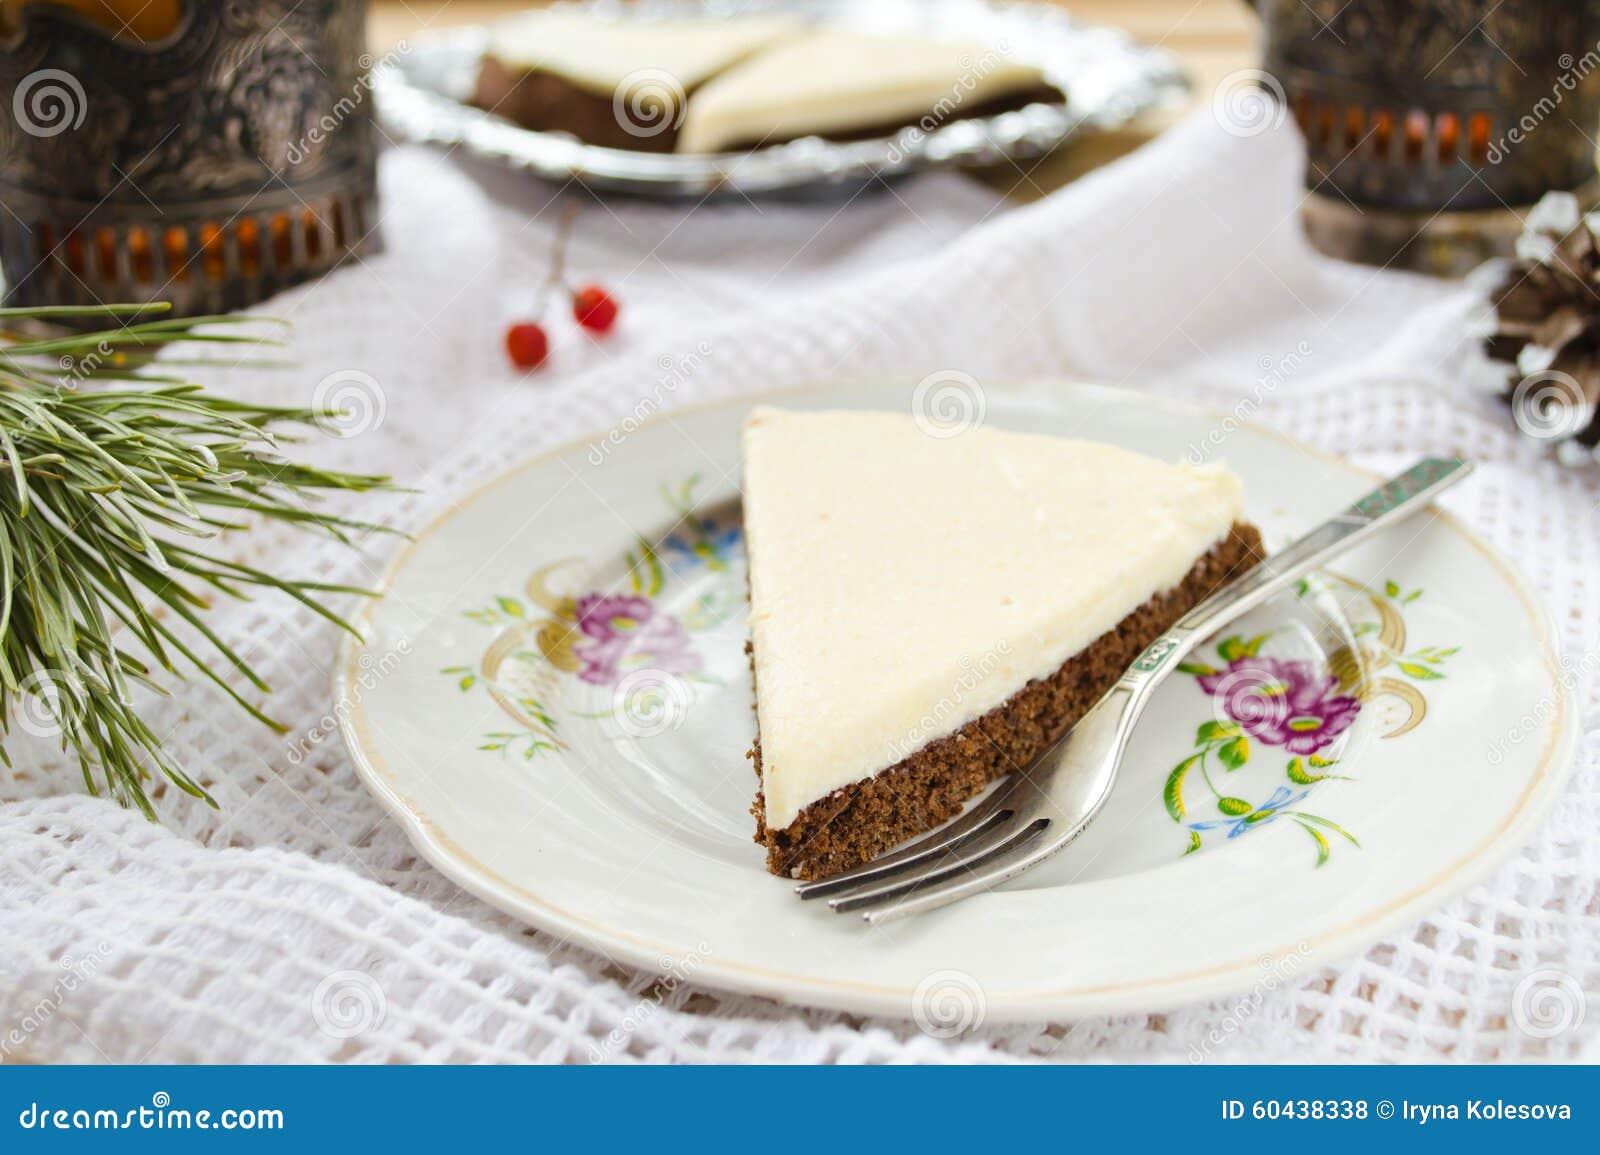 Homemade Chocolate Pie With Cream Cheese Stock Photo - Image: 60438338